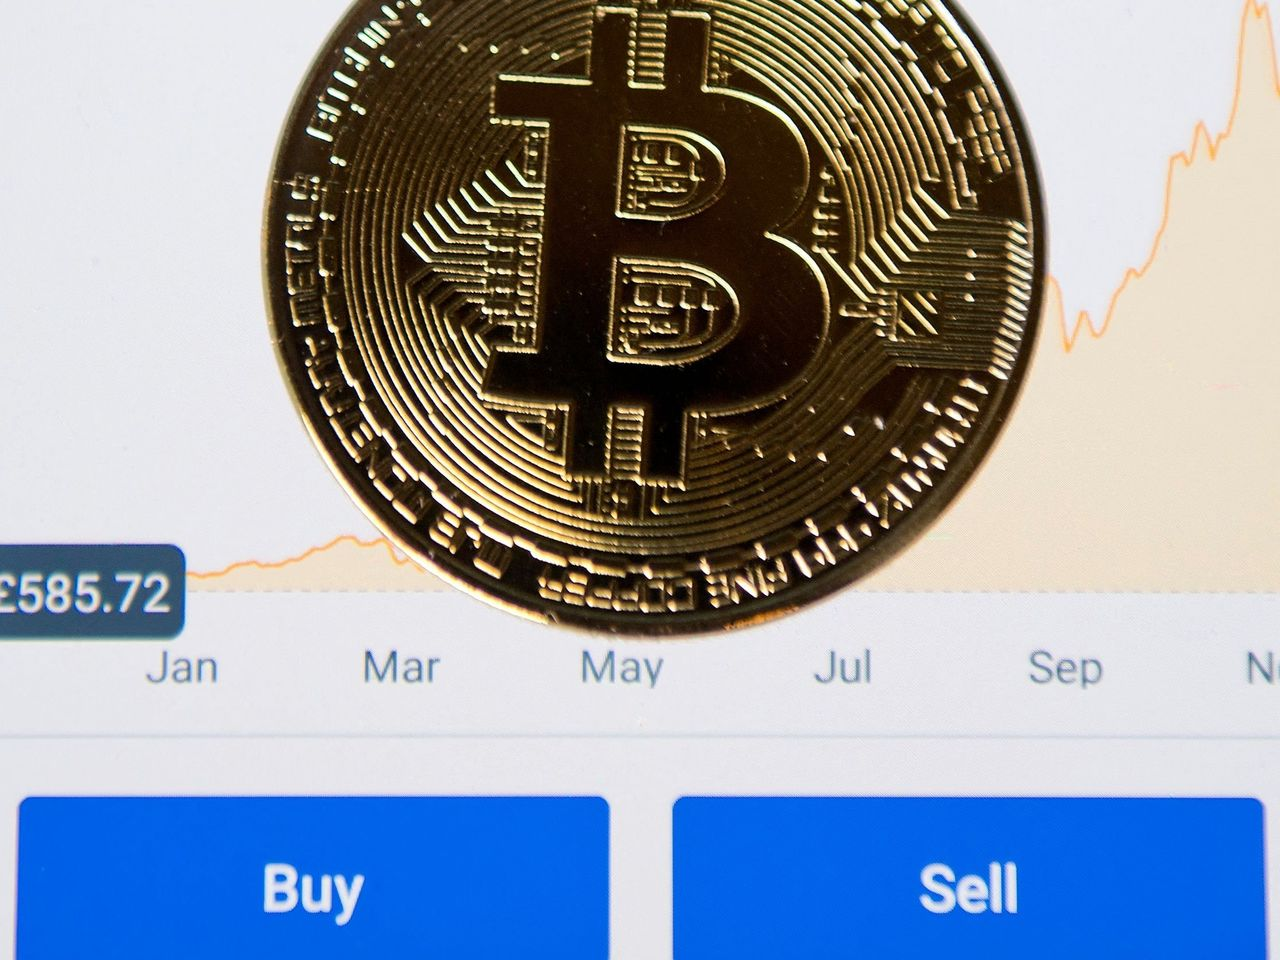 Coinbase Ipo Transfer Of Satoshi S 46 Billion Bitcoin Stash Marks One Interesting Risk Factor Marketwatch